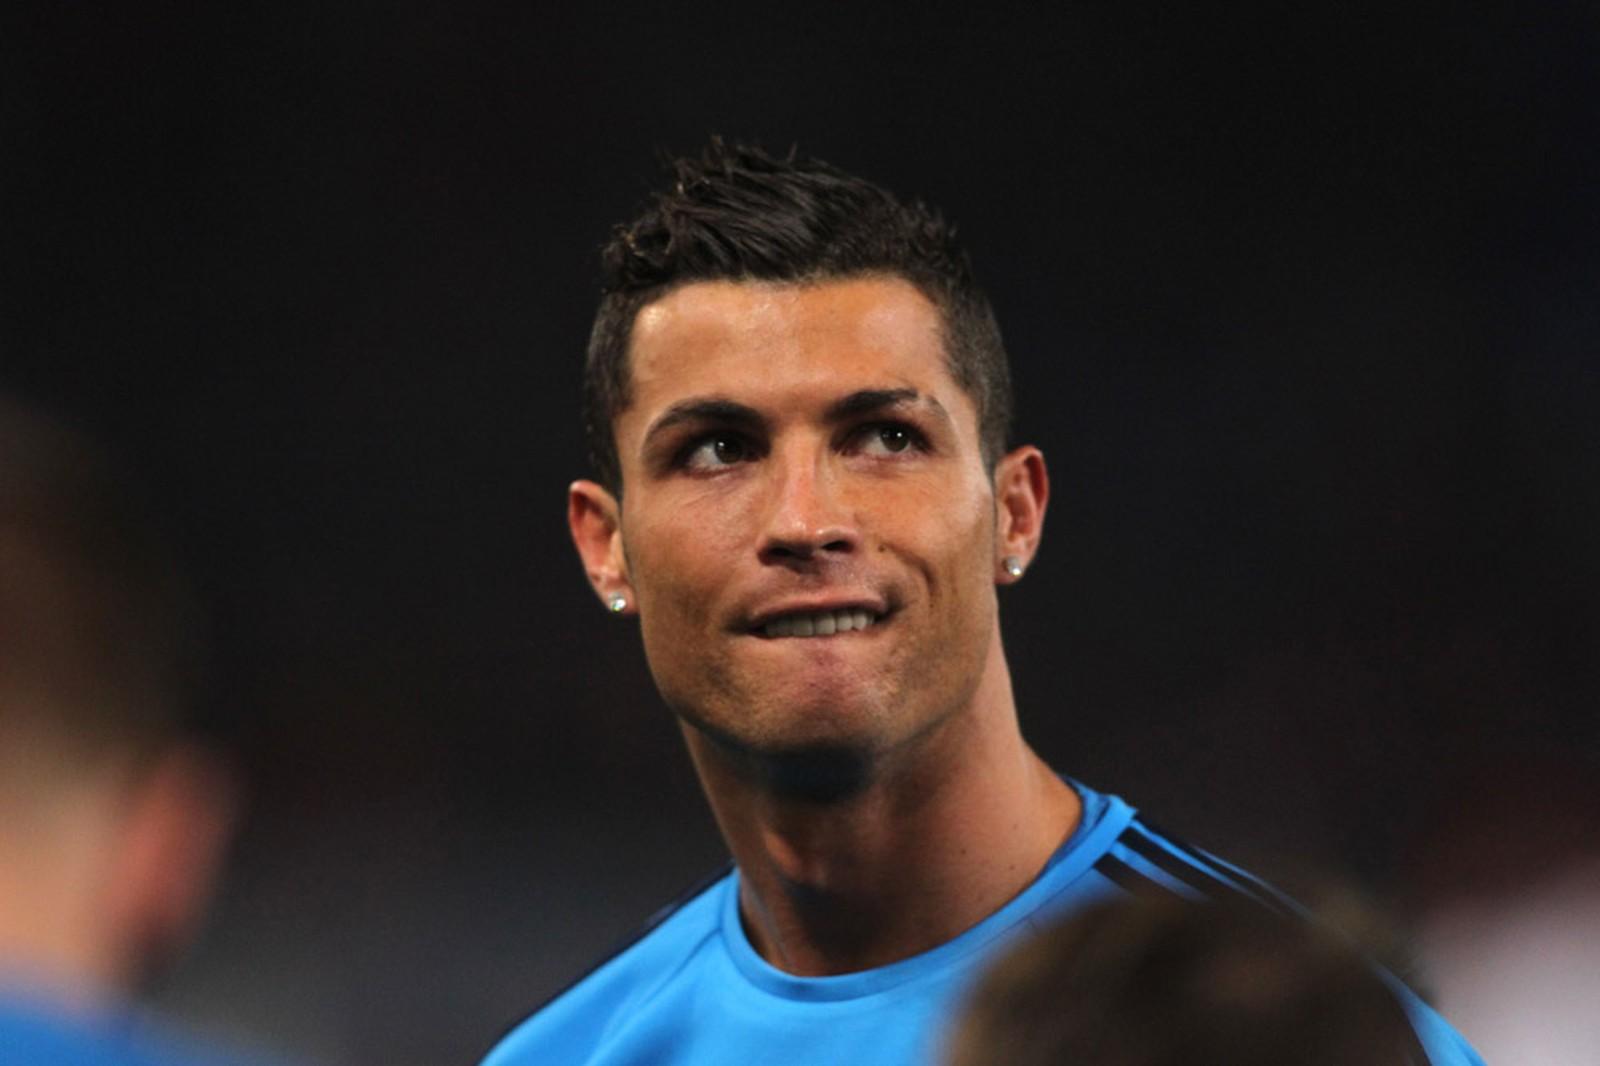 Wie Viel Verdient Cristiano Ronaldo